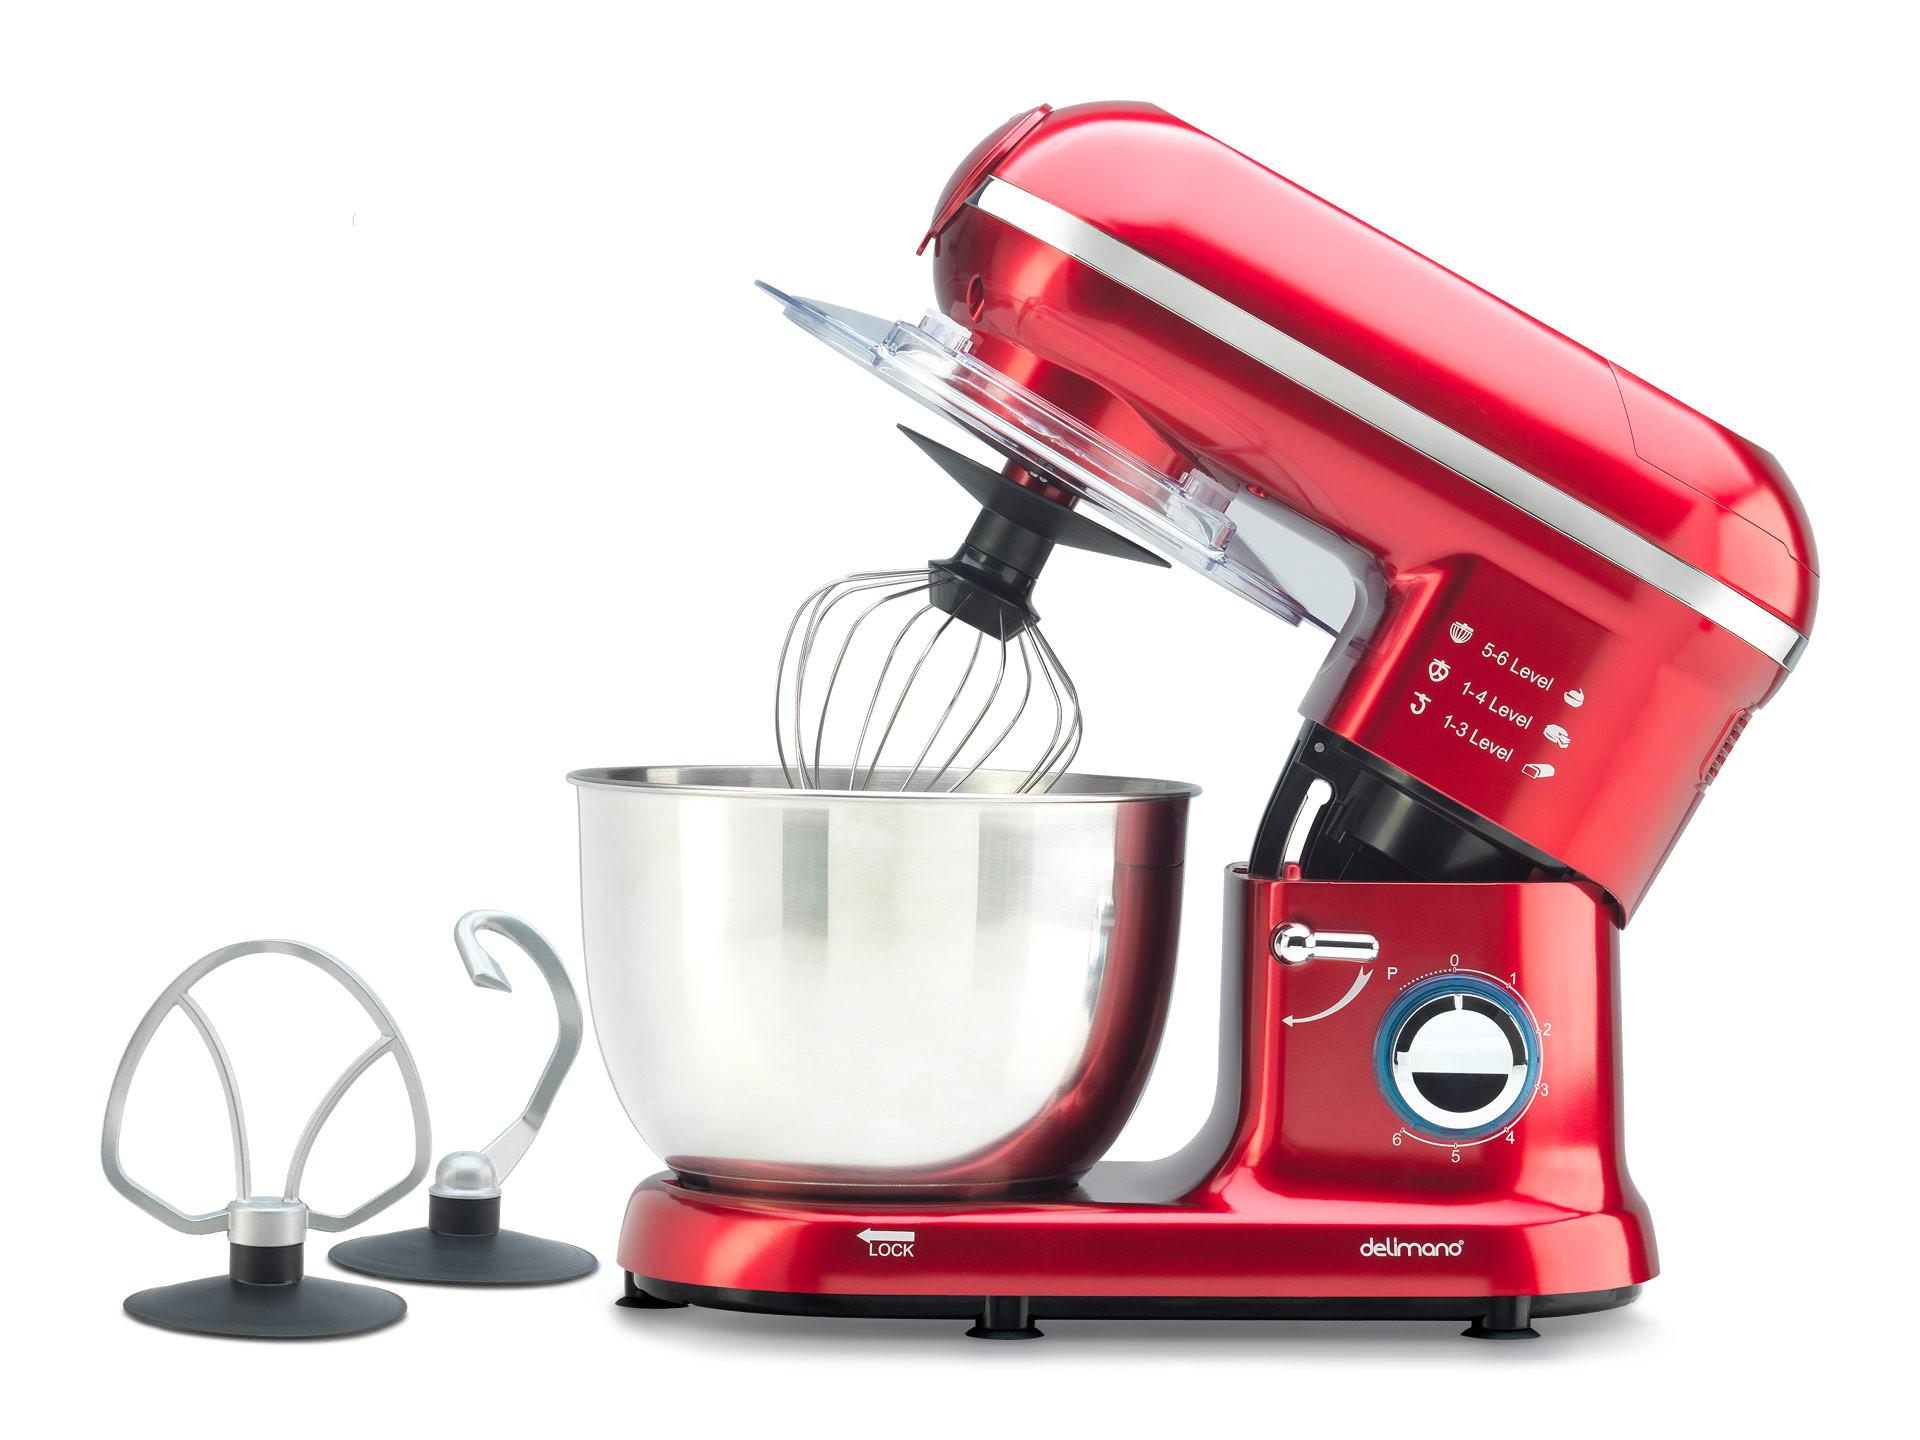 Recenzie kuchynských robotov - Kuchynský robot Delimano